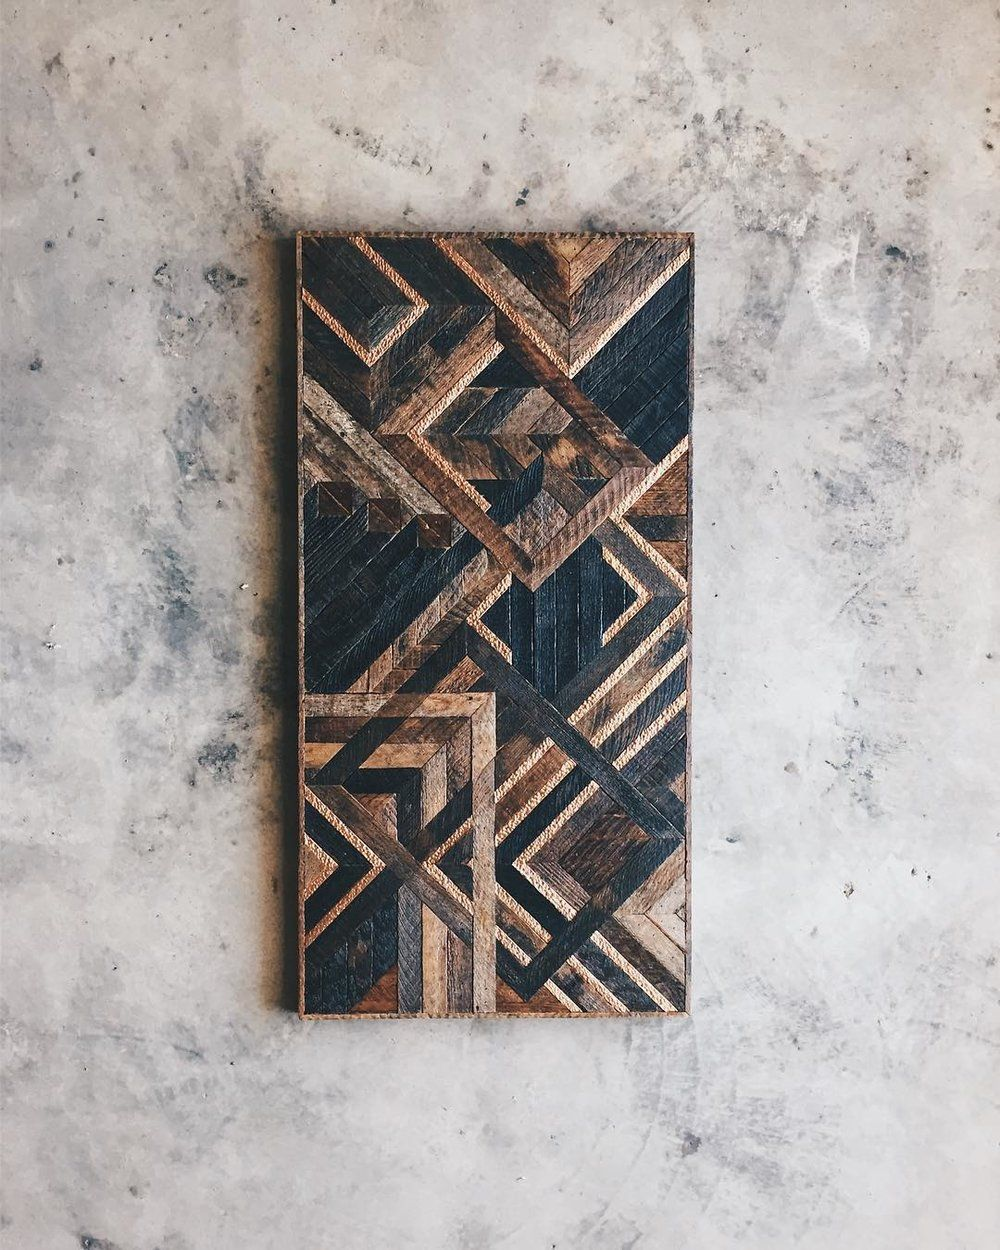 Pin by Kim Mangum on FOCUS - Ideas Pinterest Holz, Holz Ideen